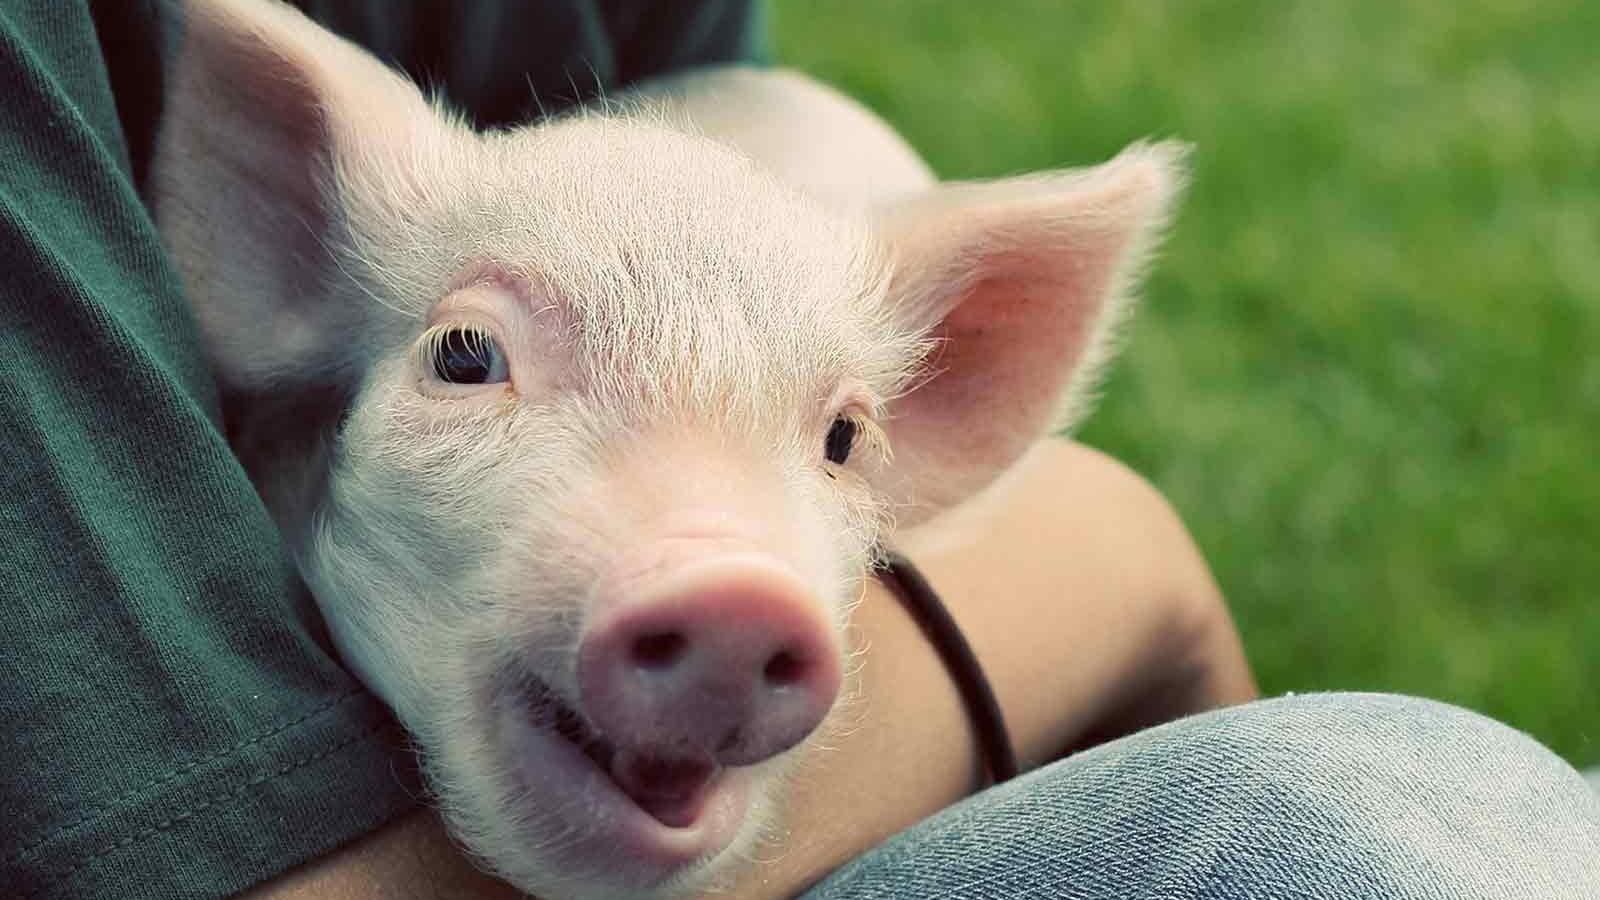 Pig held by man (Getty)